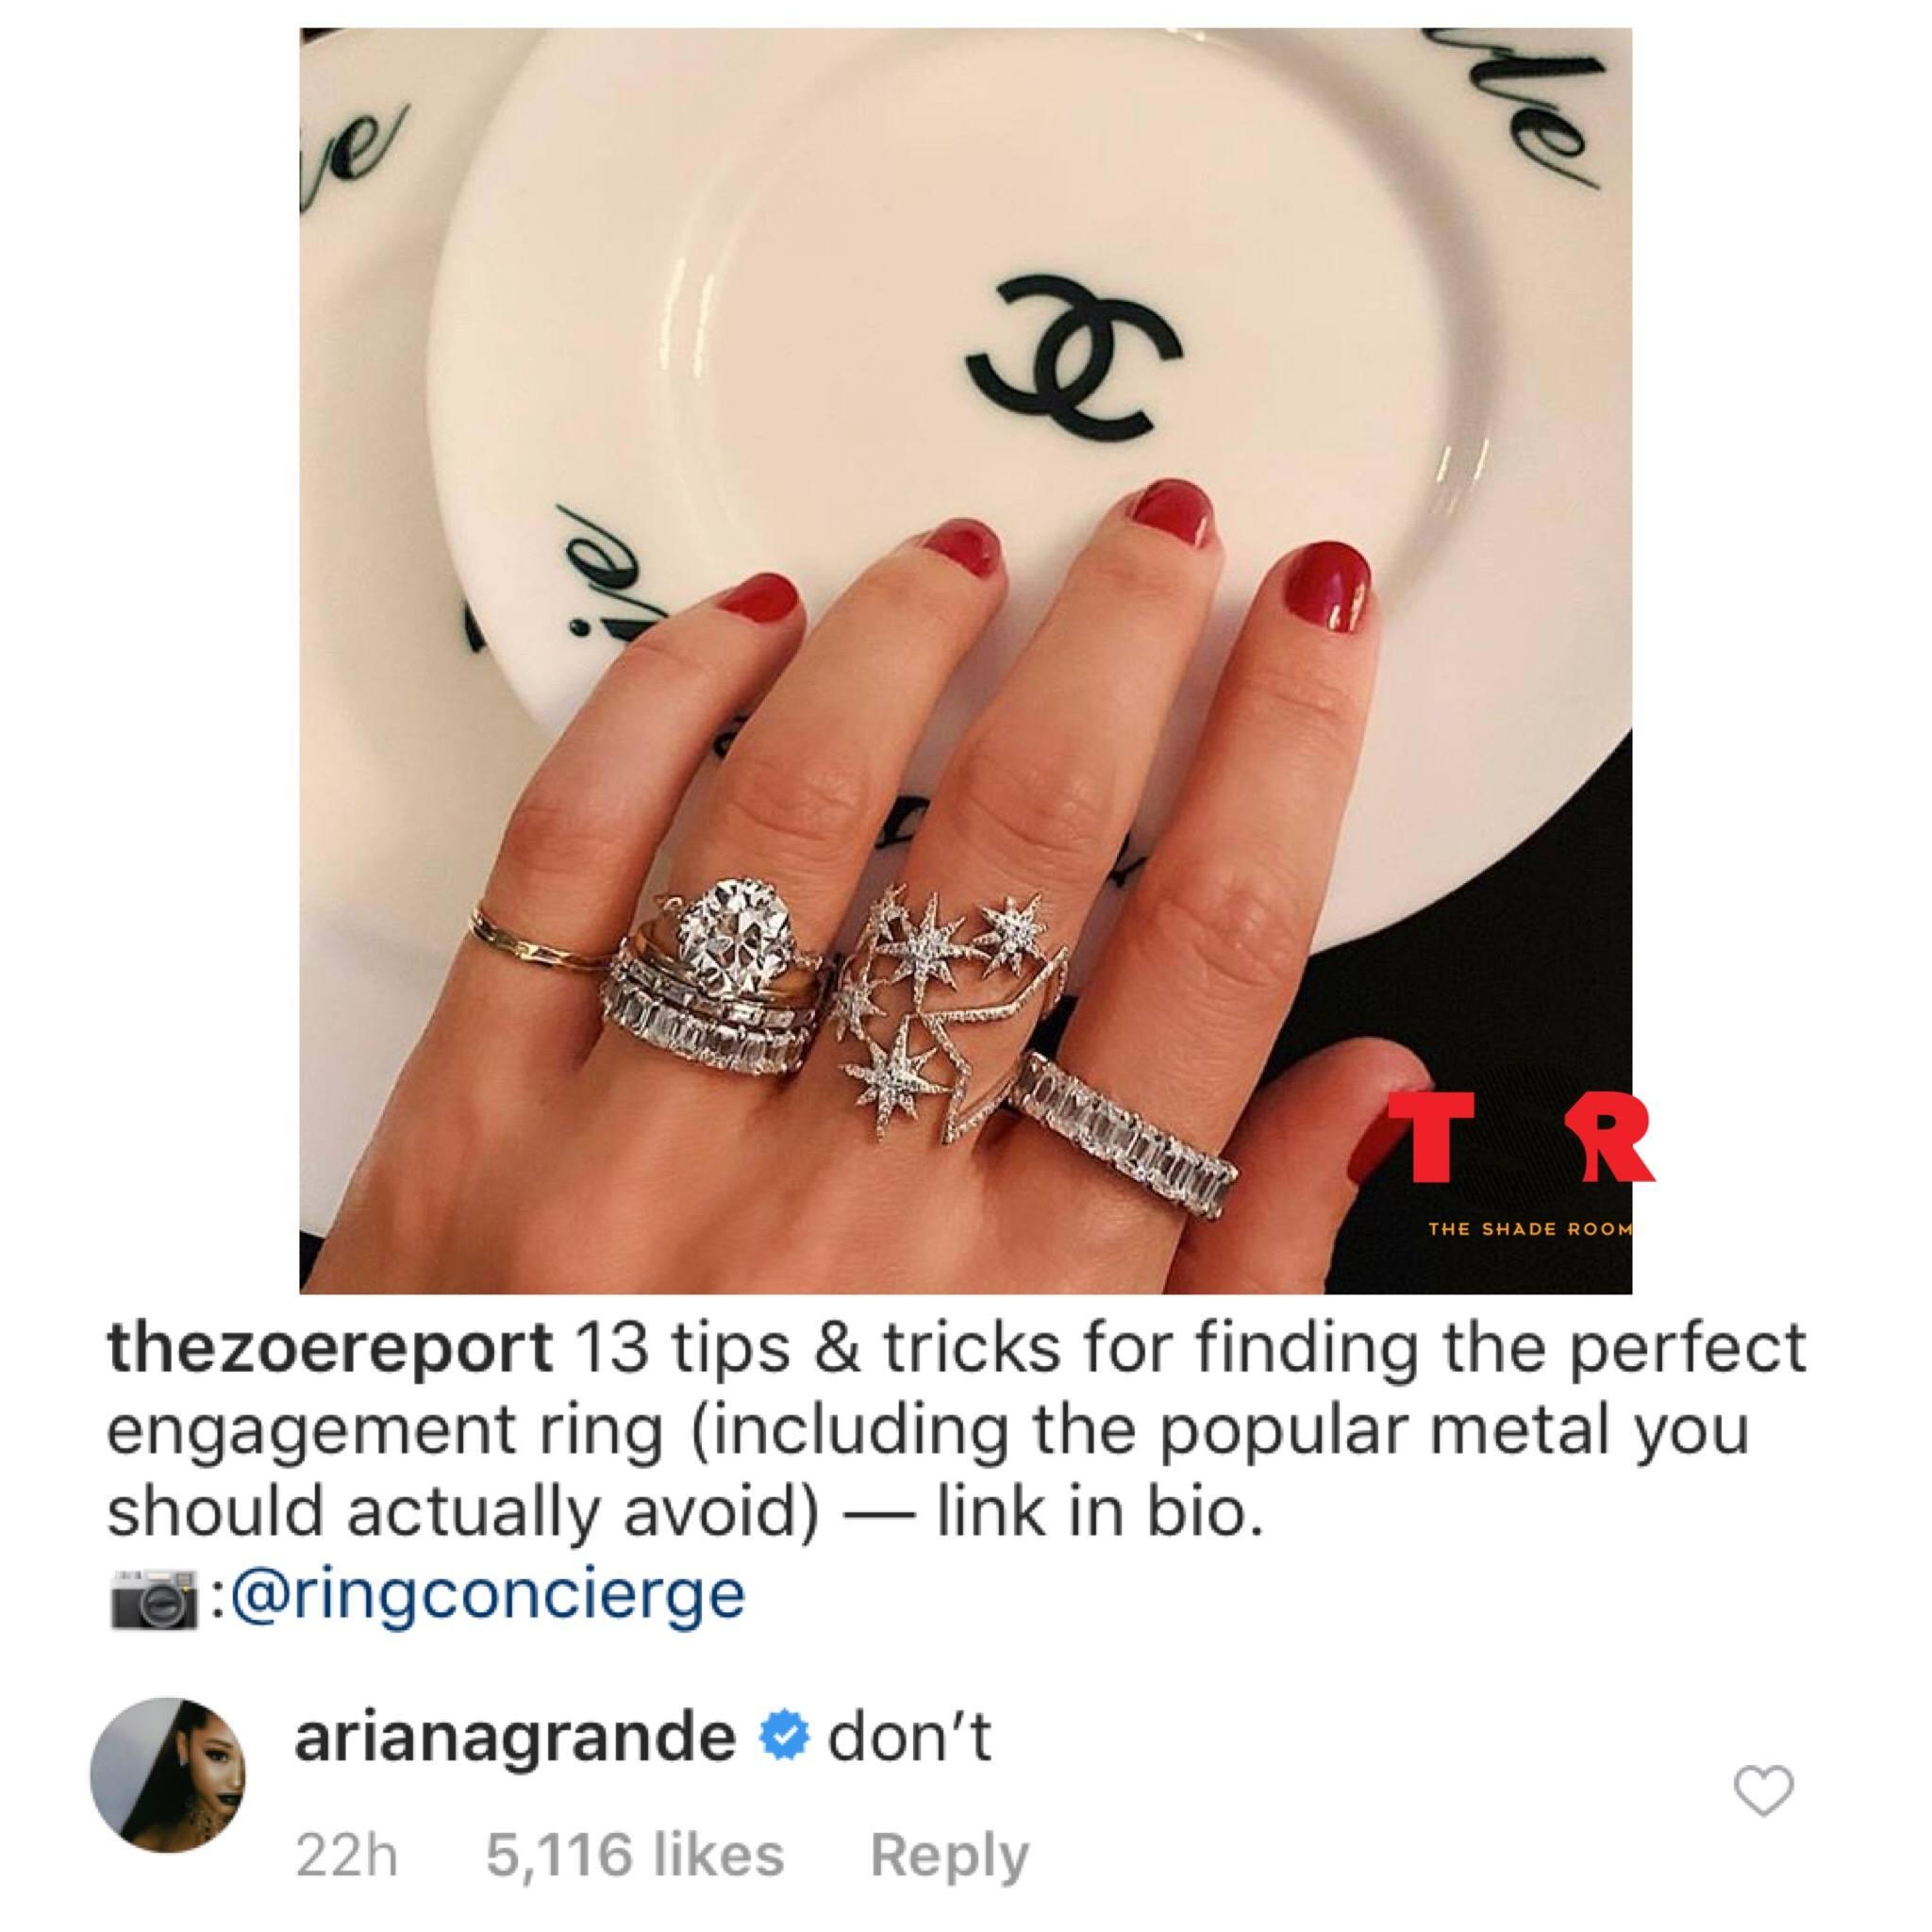 Ariana Grande and the Zoe Report